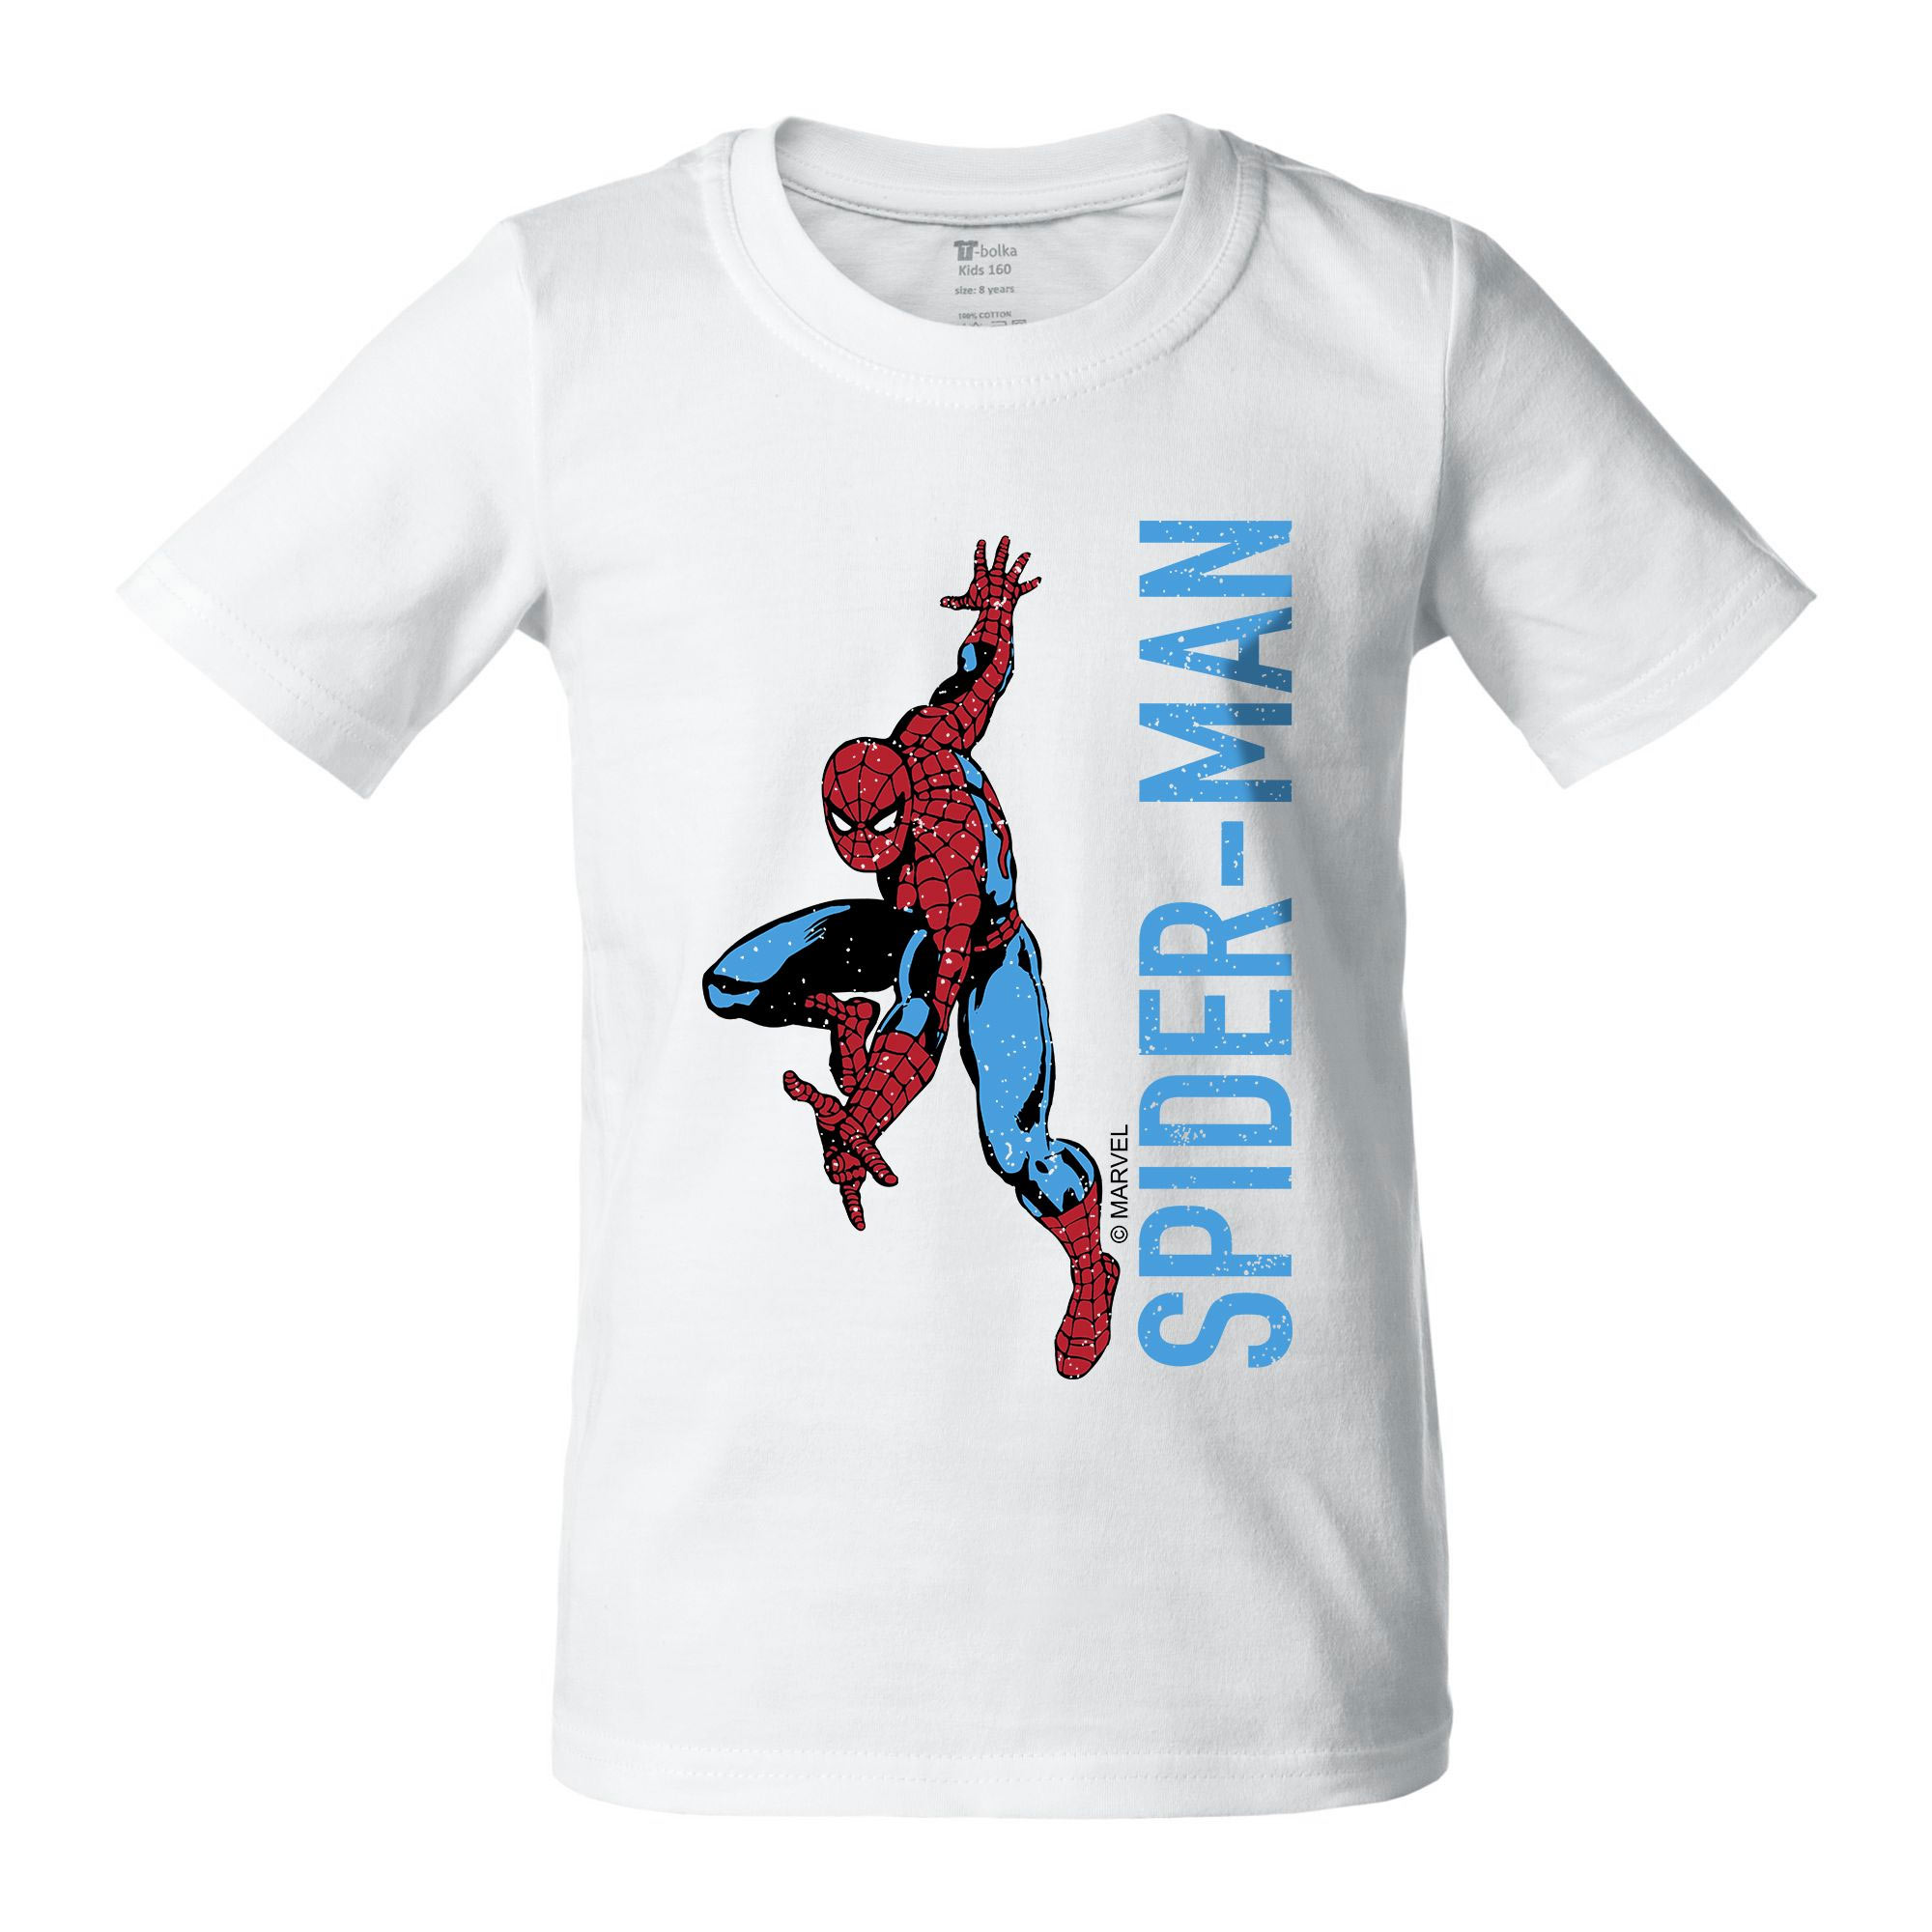 Футболка детская Spider-Man, белая арт 55582.61